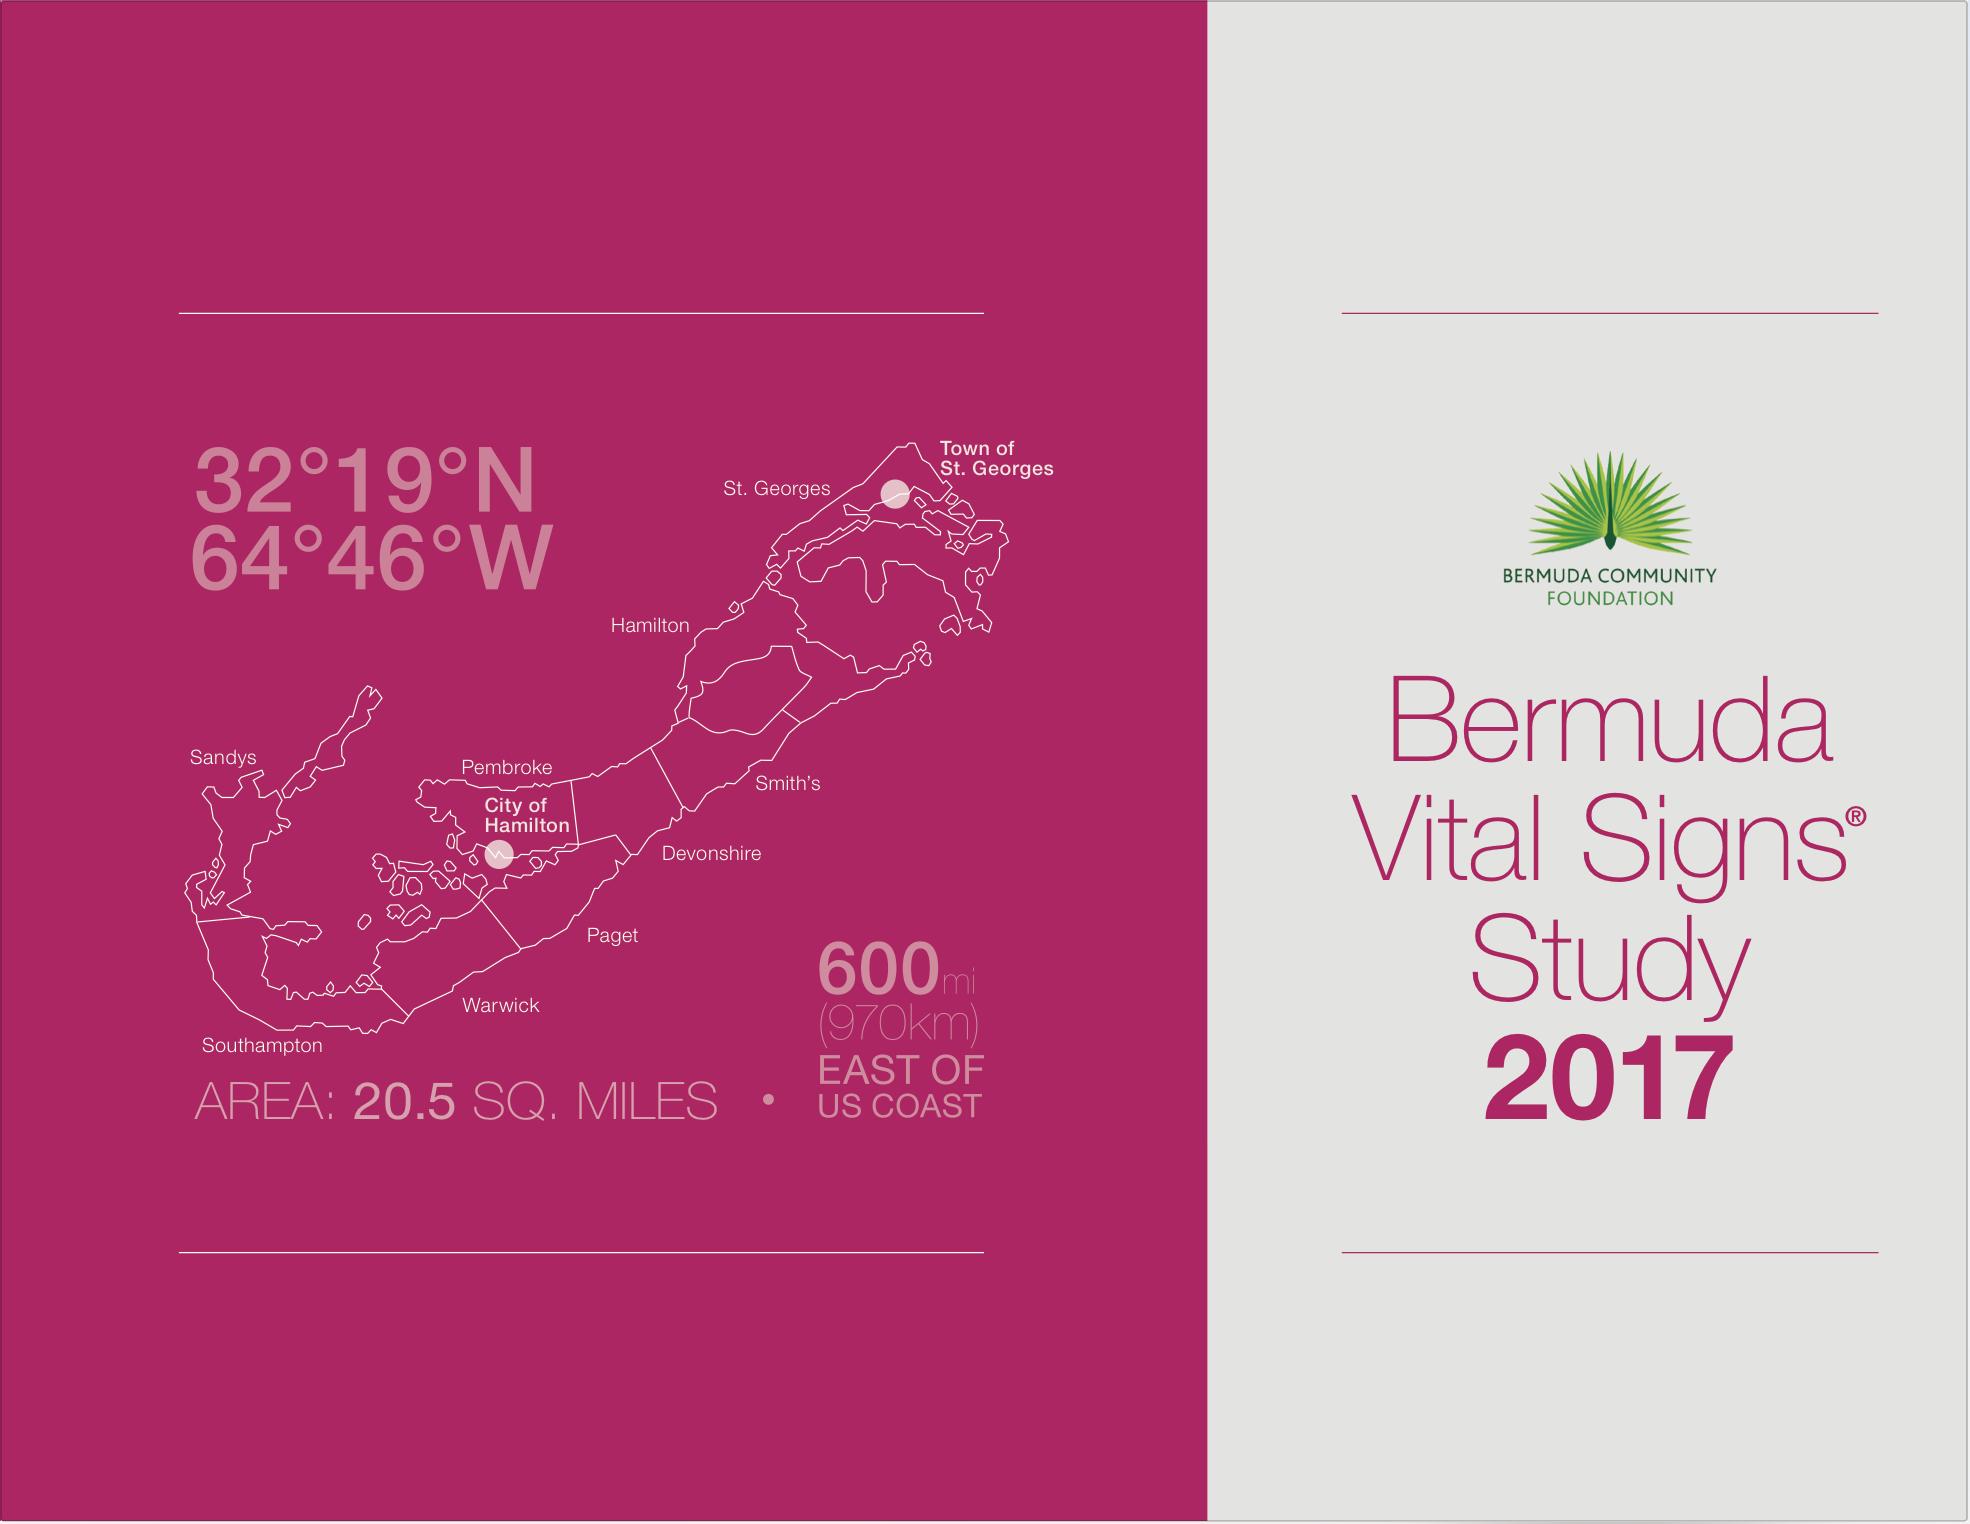 Bermuda Vital Signs Study 2017 – Media Coverage